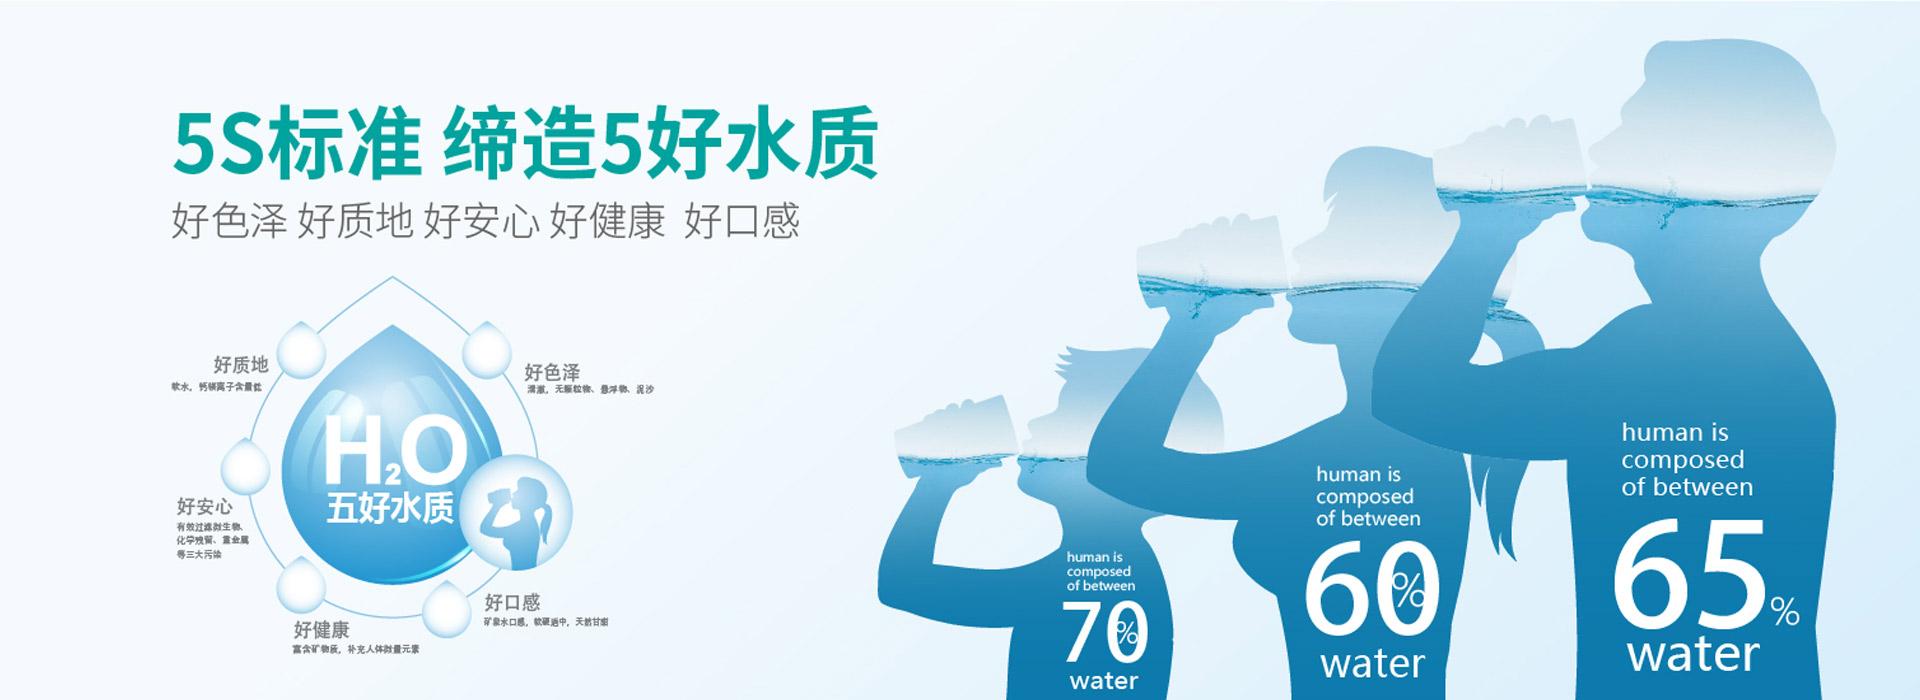 淨(jing)水器(qi)廠家5S標(biao)準地数量,締造(zao)5好meng)  class=